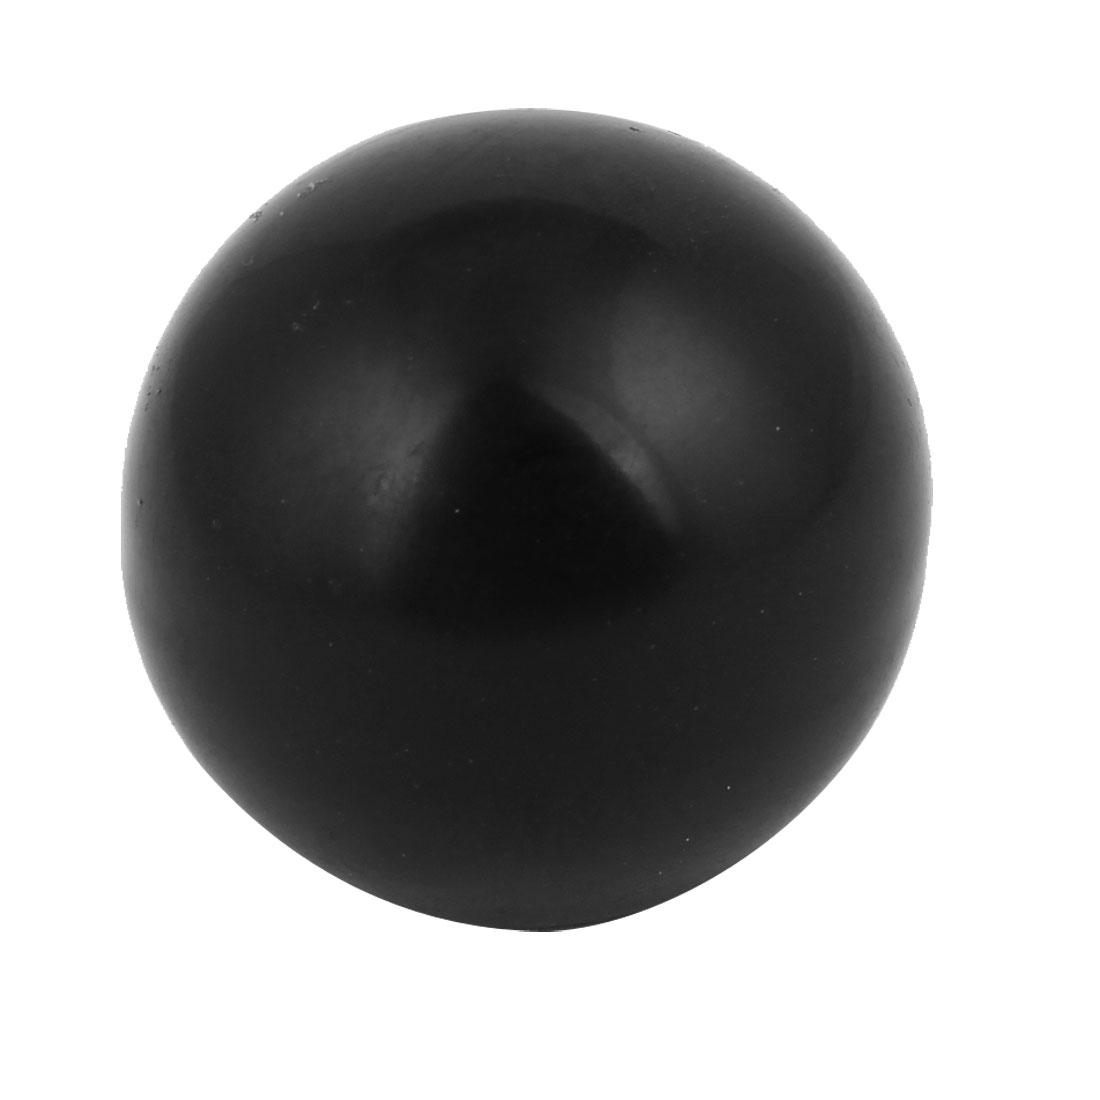 8mm Threaded 32mm Diameter Round Ball Knob Black